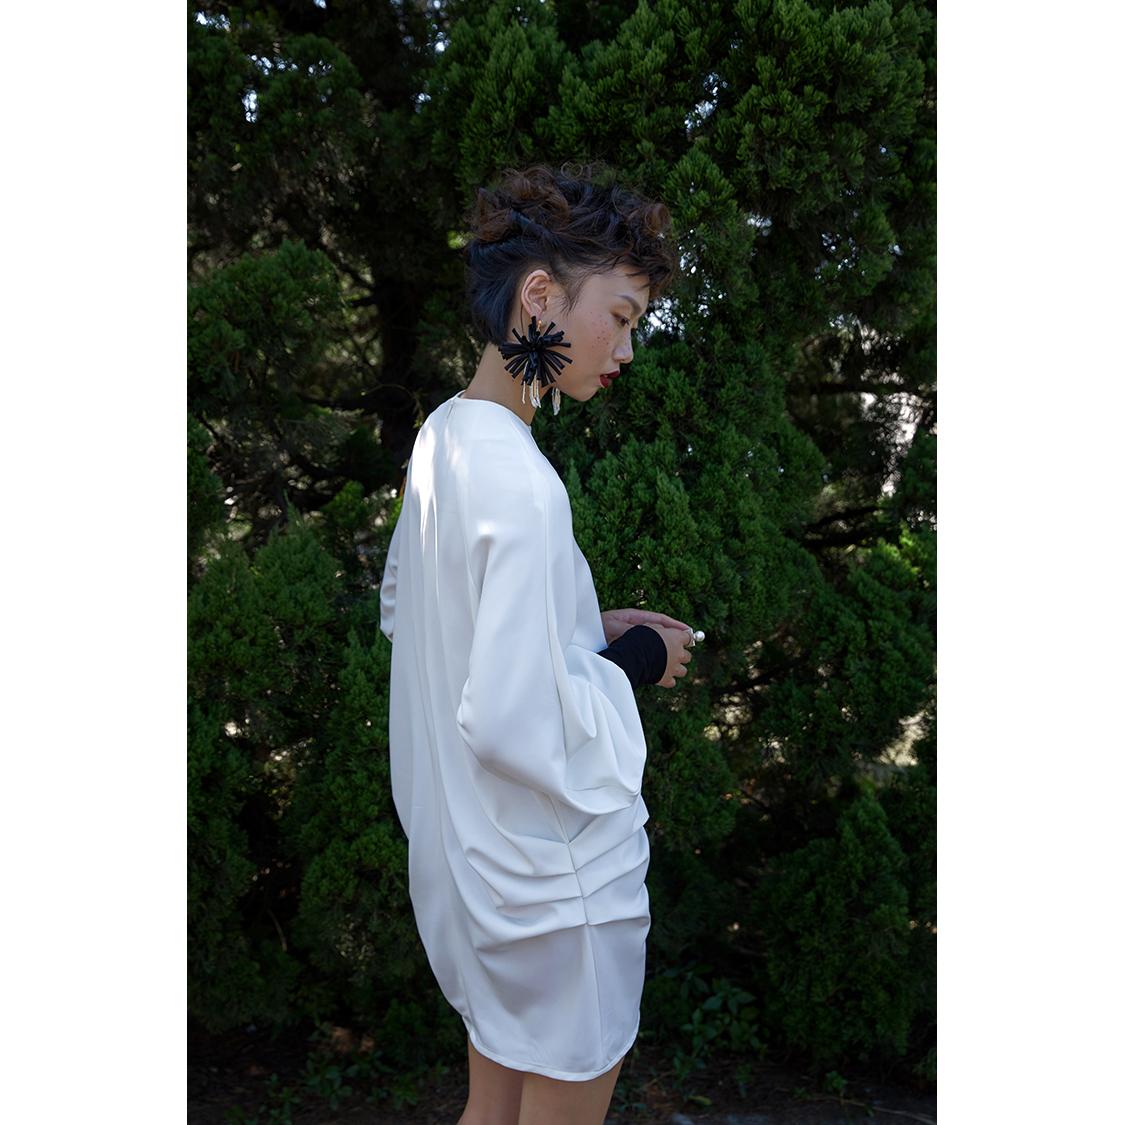 TMSstudio17FW 褶子宽松插肩大袖针织袖口设计中长上衣连衣裙